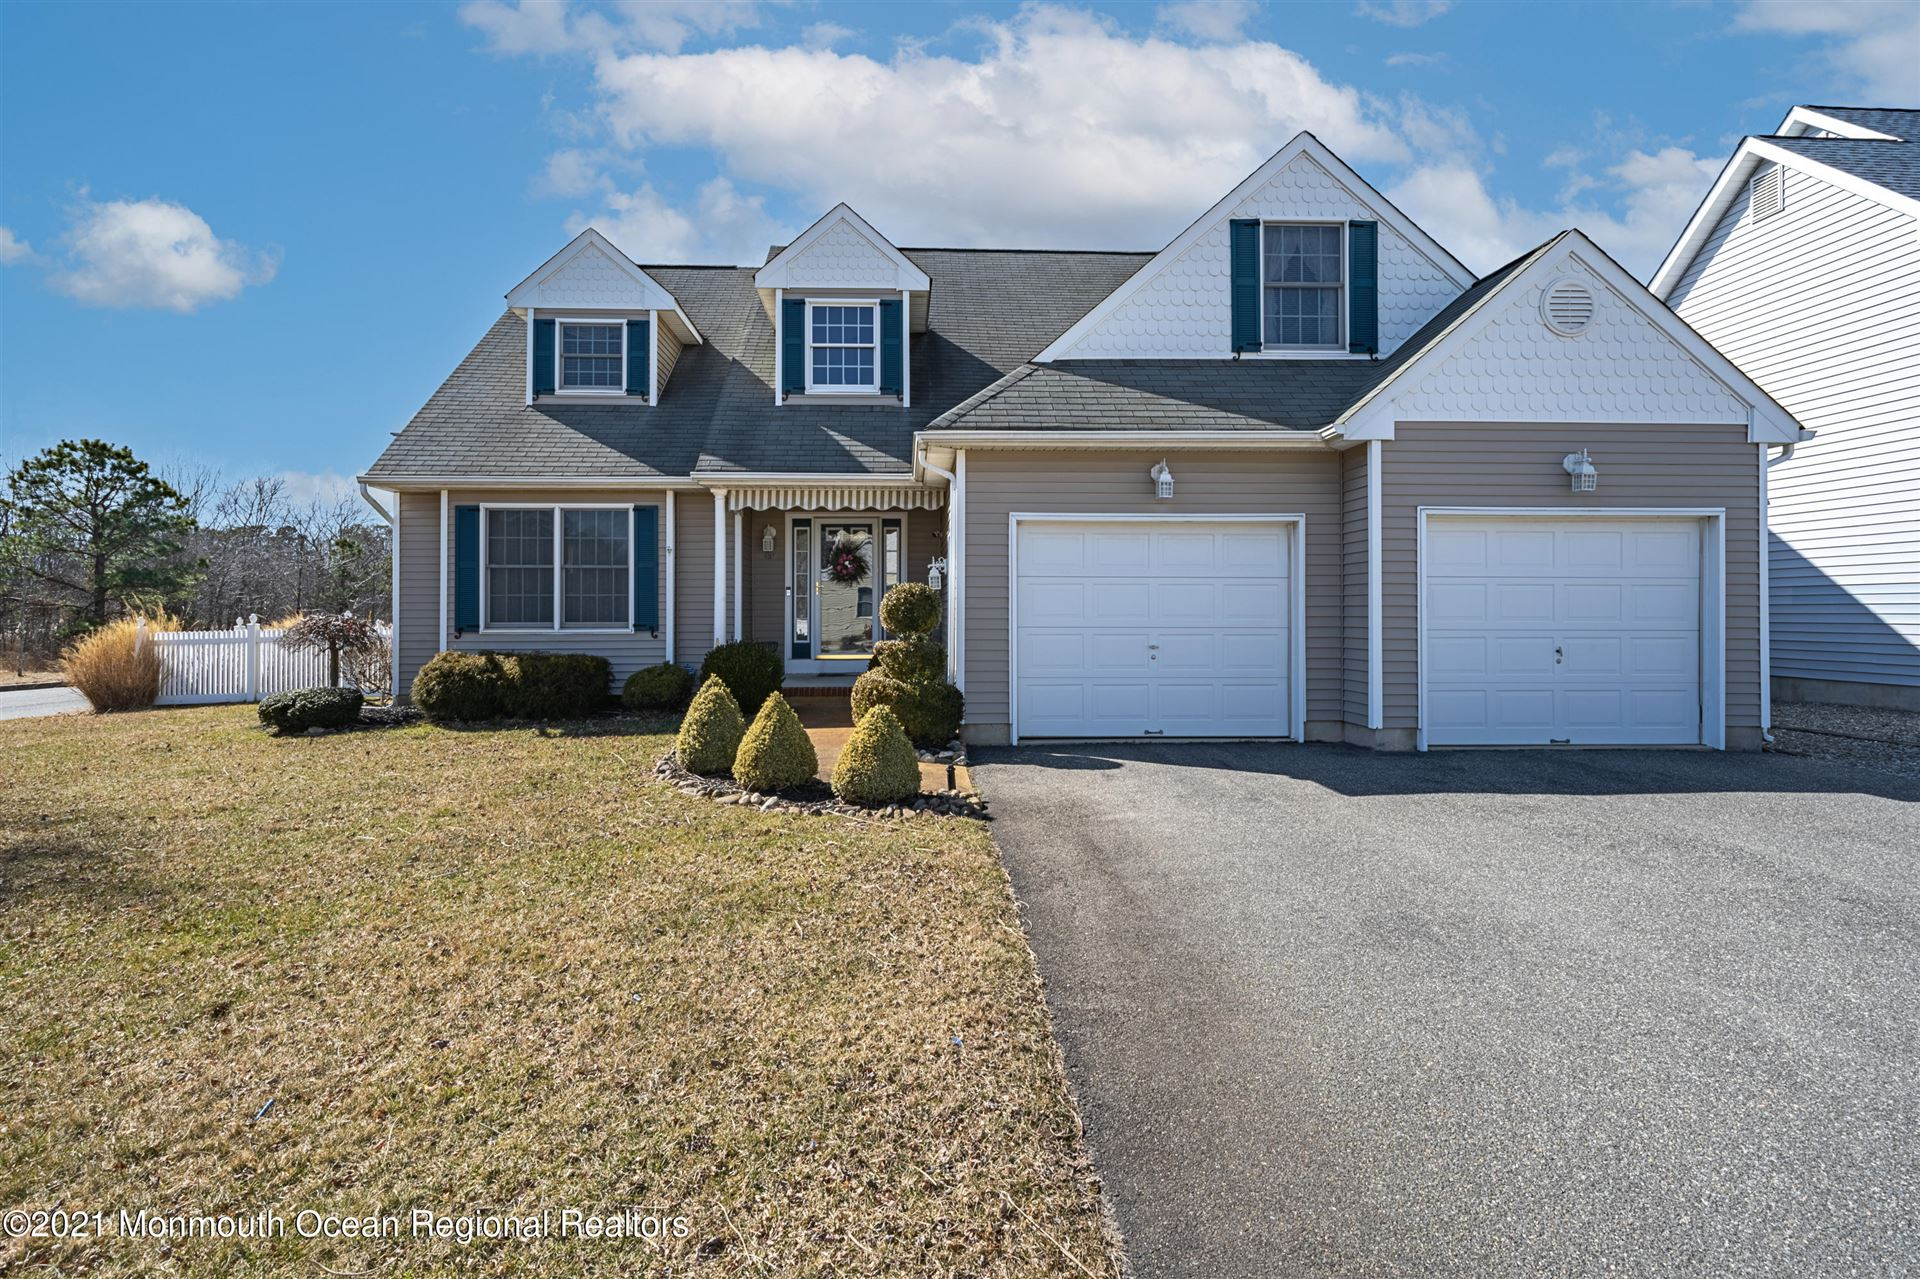 402 Hidden Harbor Place, Lanoka Harbor, NJ 08734 - MLS#: 22107261